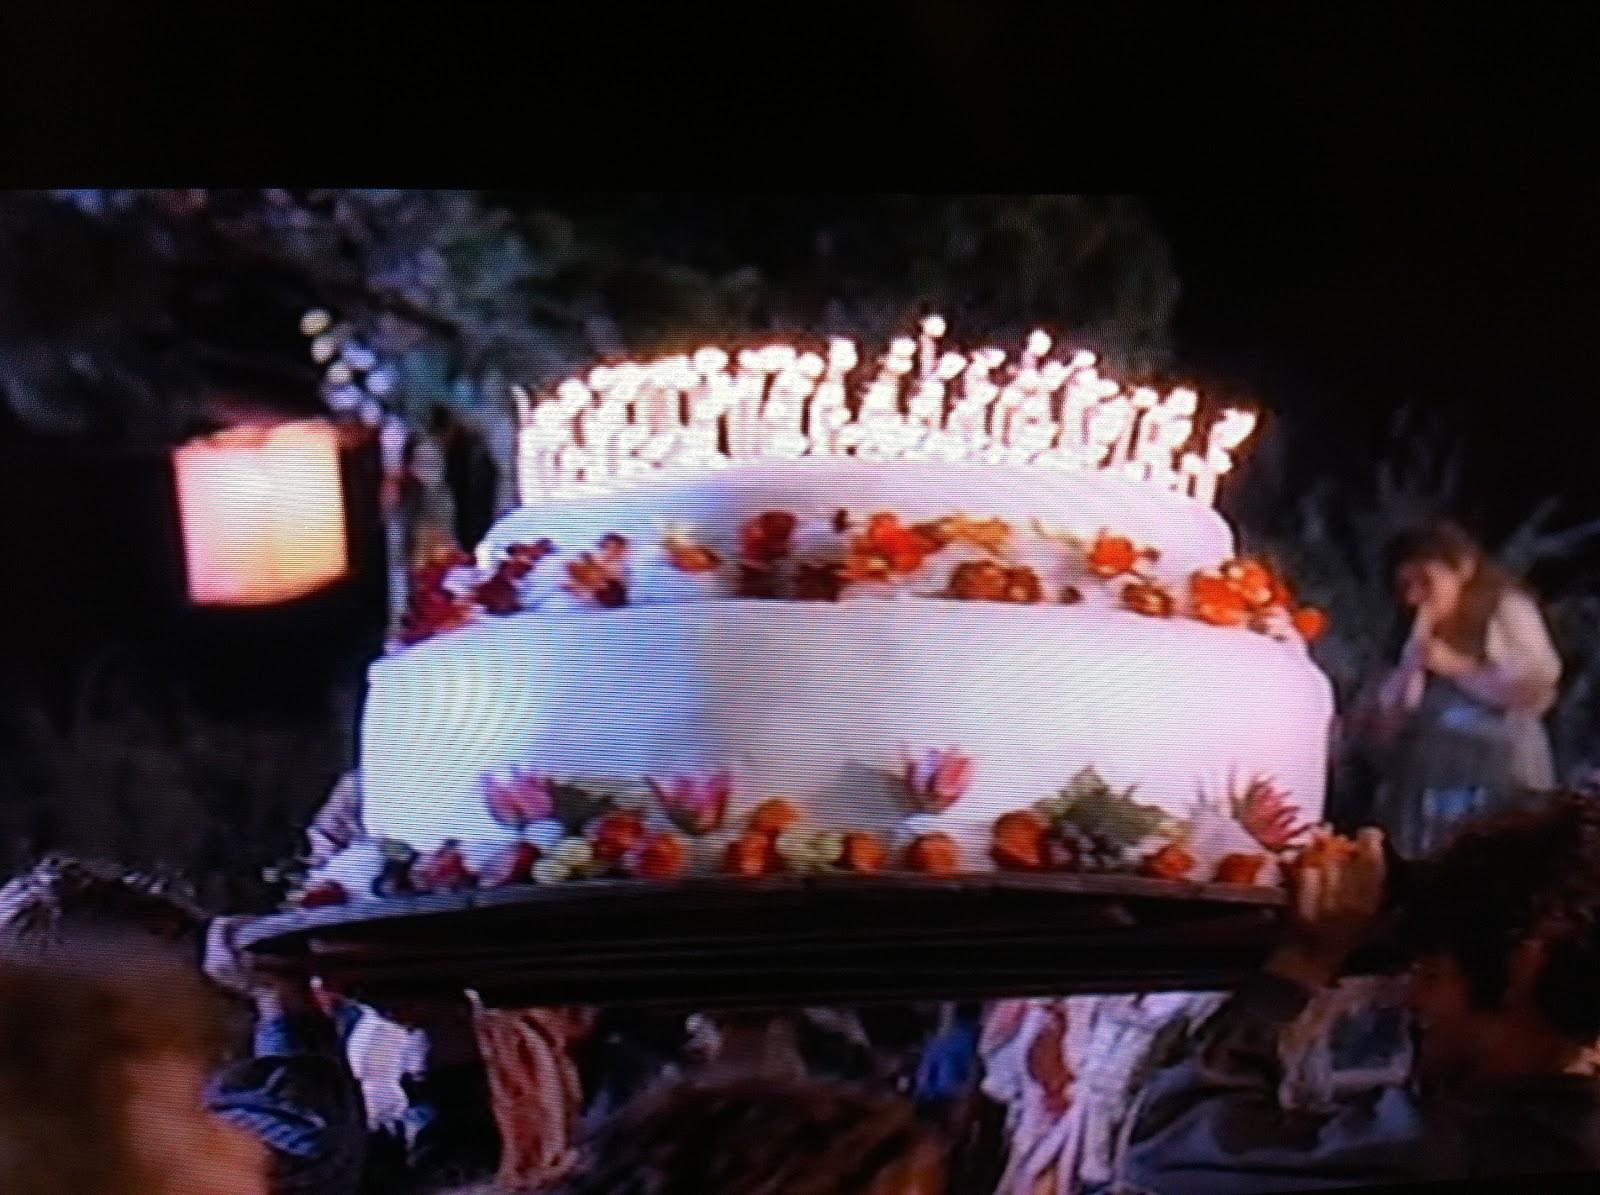 Birthday Cake Screencap